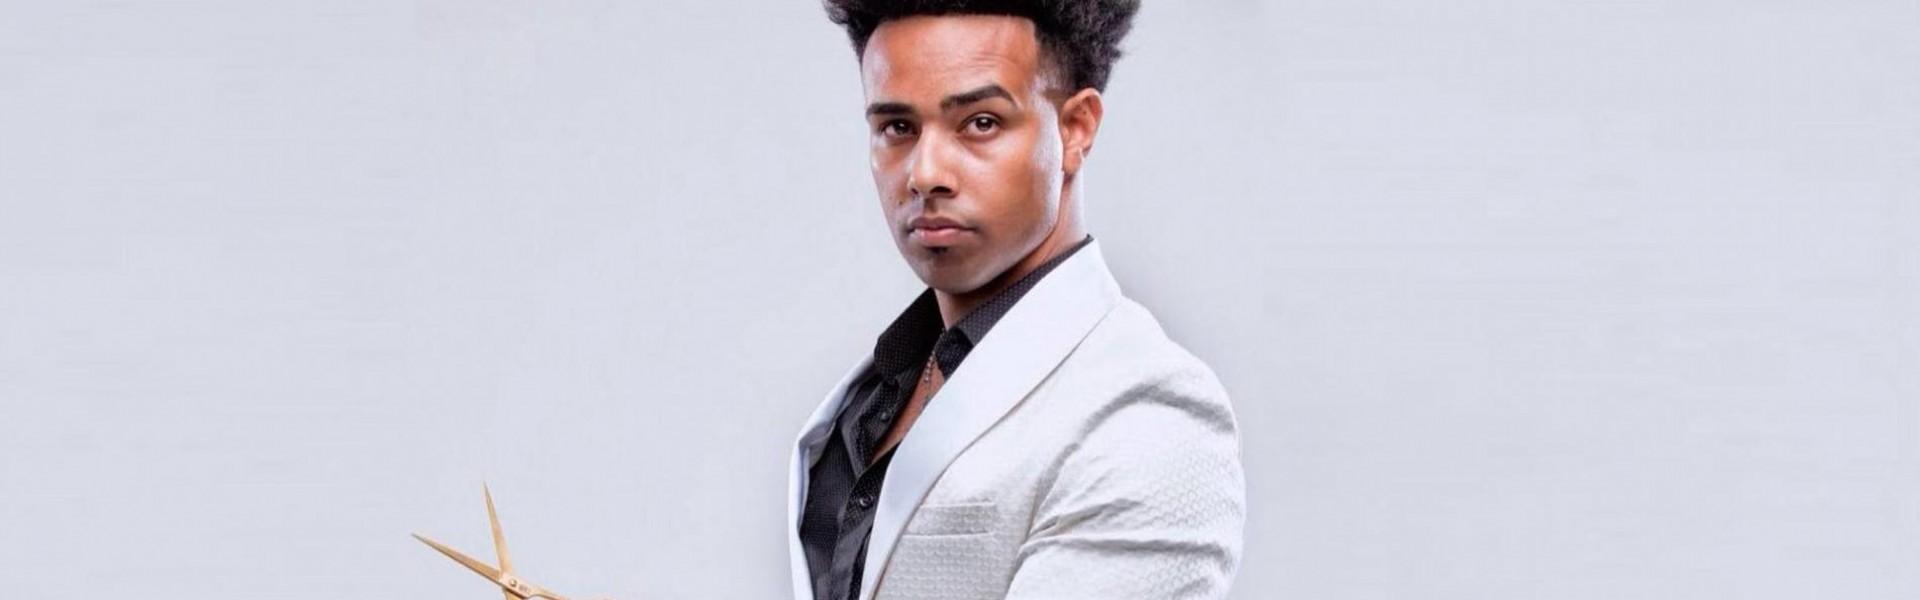 Eduardo Muller vem a Cuiabá ensinar técnicas para cabelos masculinos